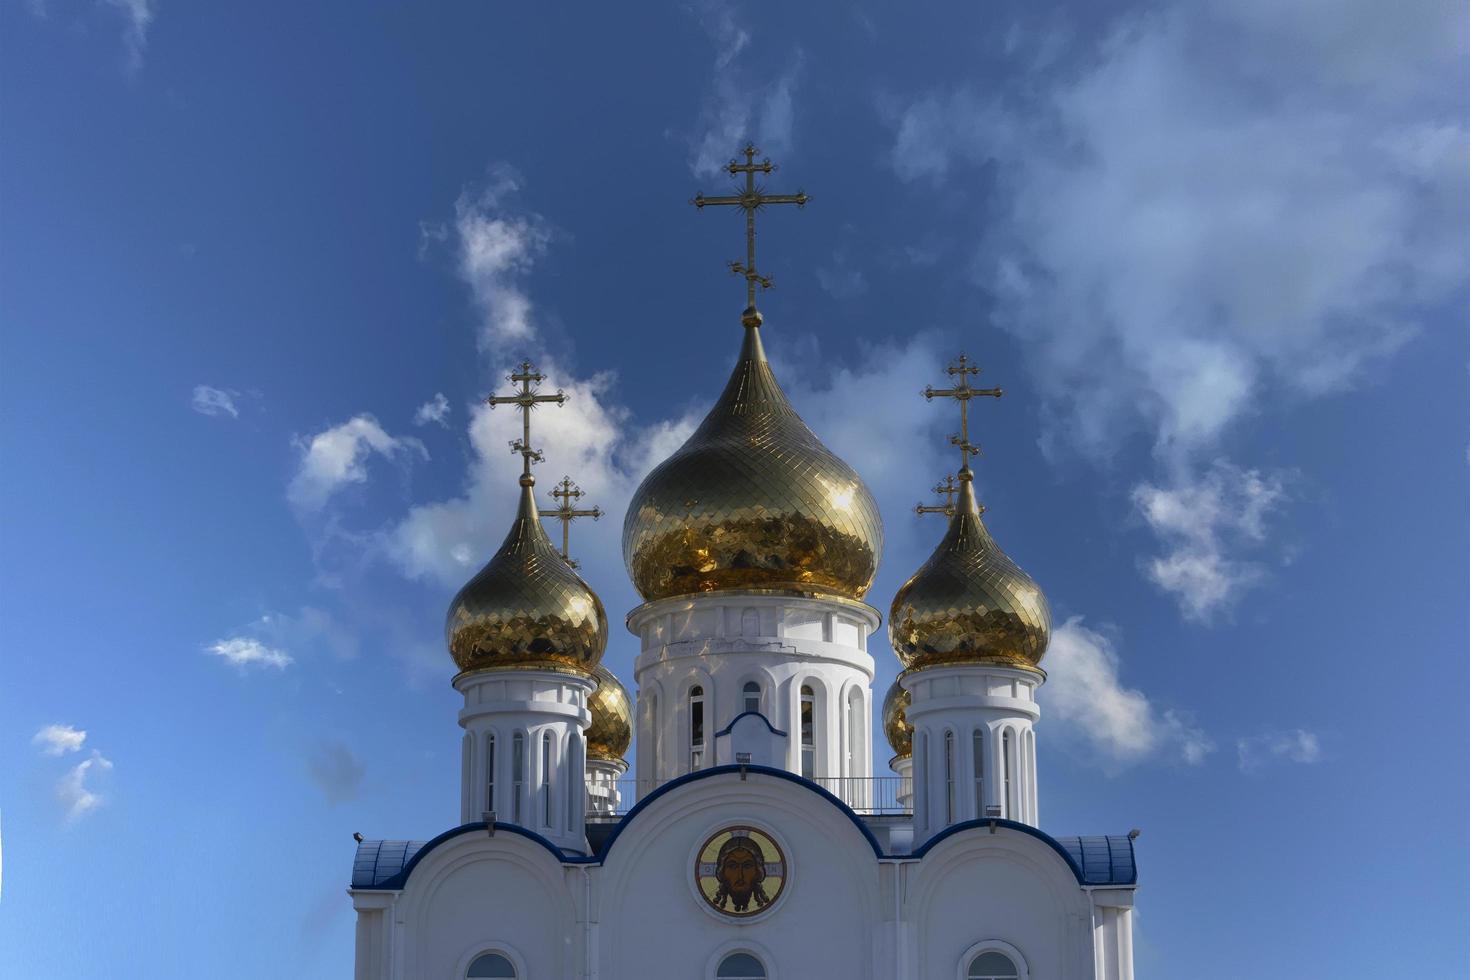 catedral ortodoxa russa - petropavlovsk-kamchatsky foto